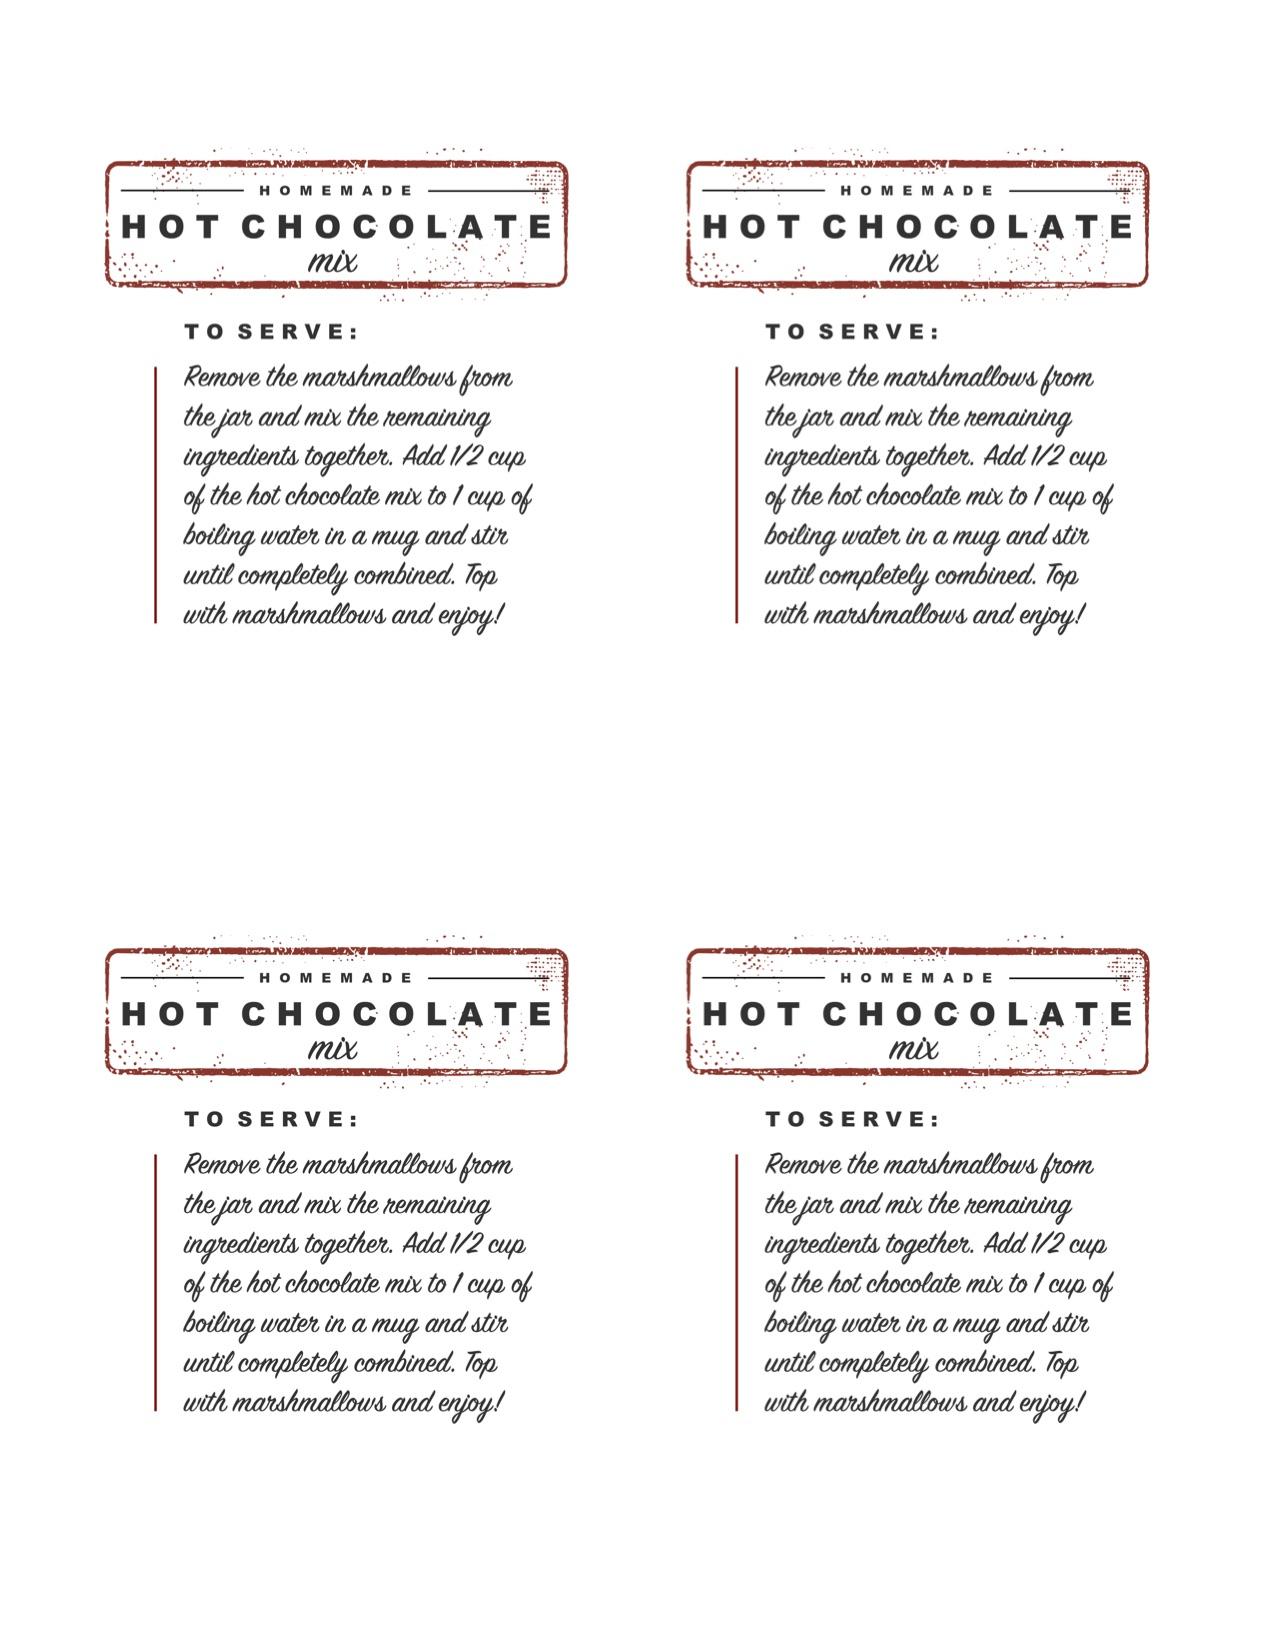 Hot Chocolate Mix To Make Brownies